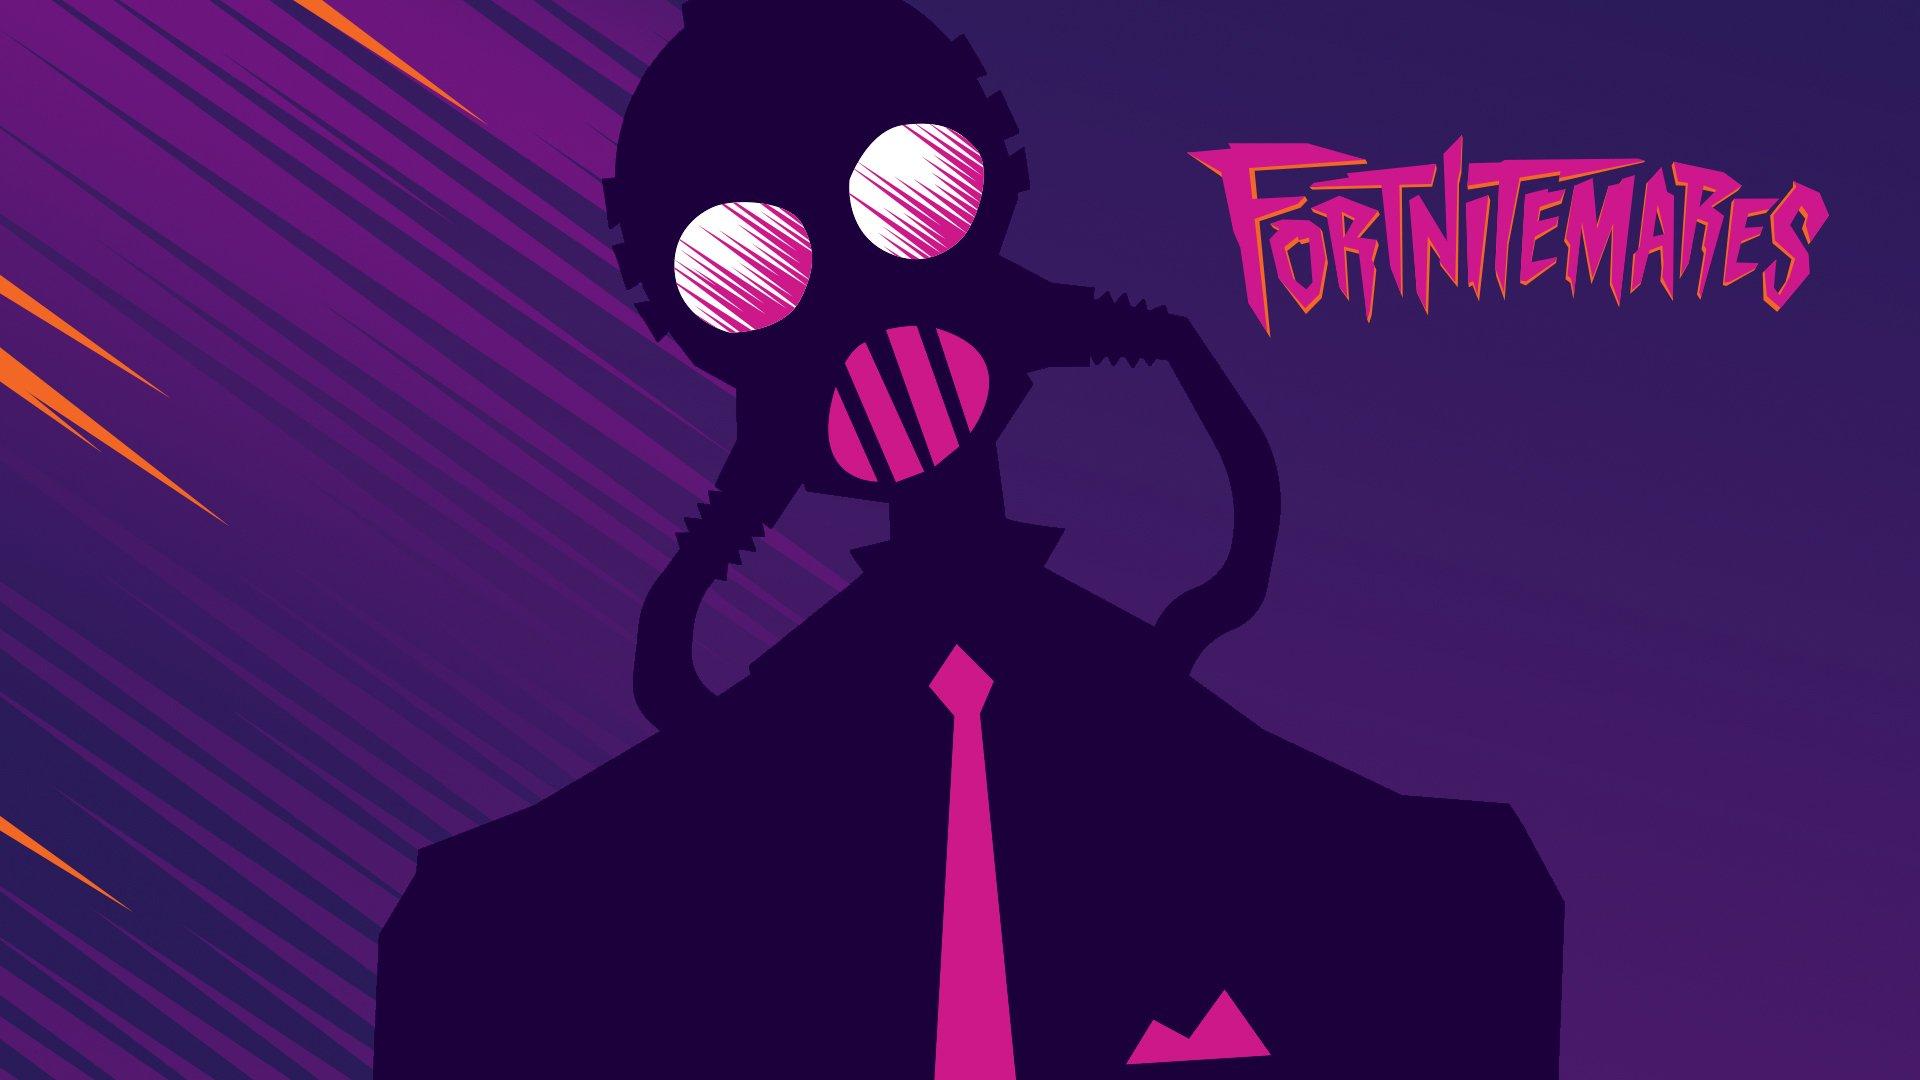 Fornitemares 2019 starts tomorrow October 29 GamesRadar 1920x1080